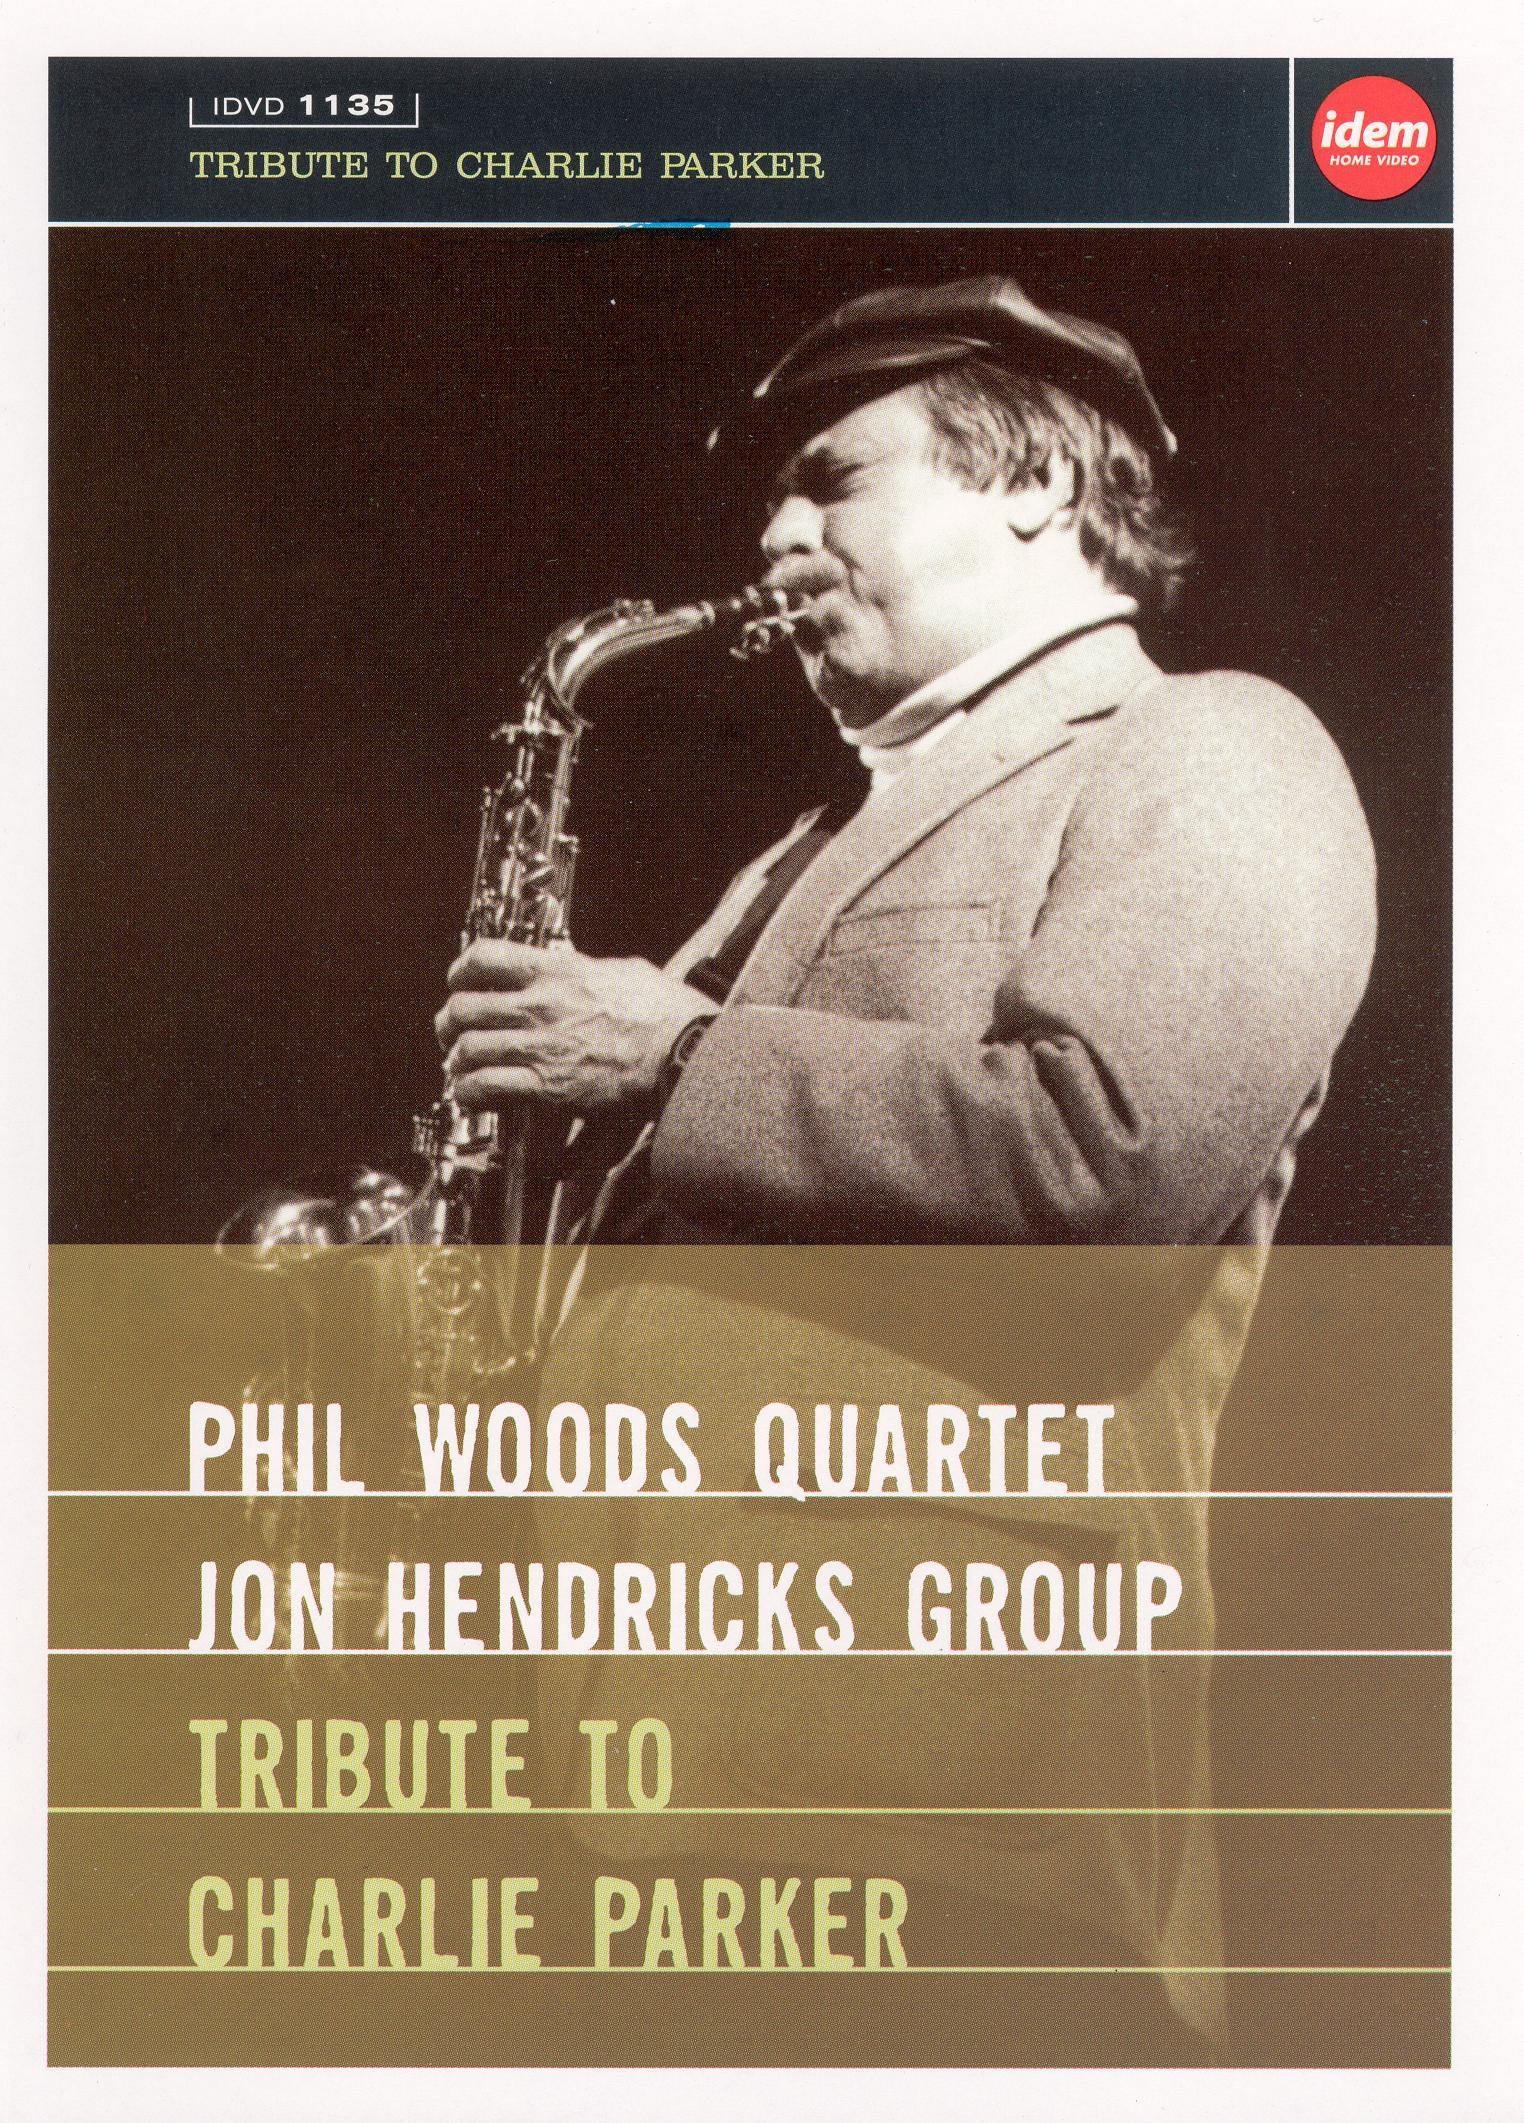 Phil Woods/Jon Hendricks: Tribute to Charlie Parker